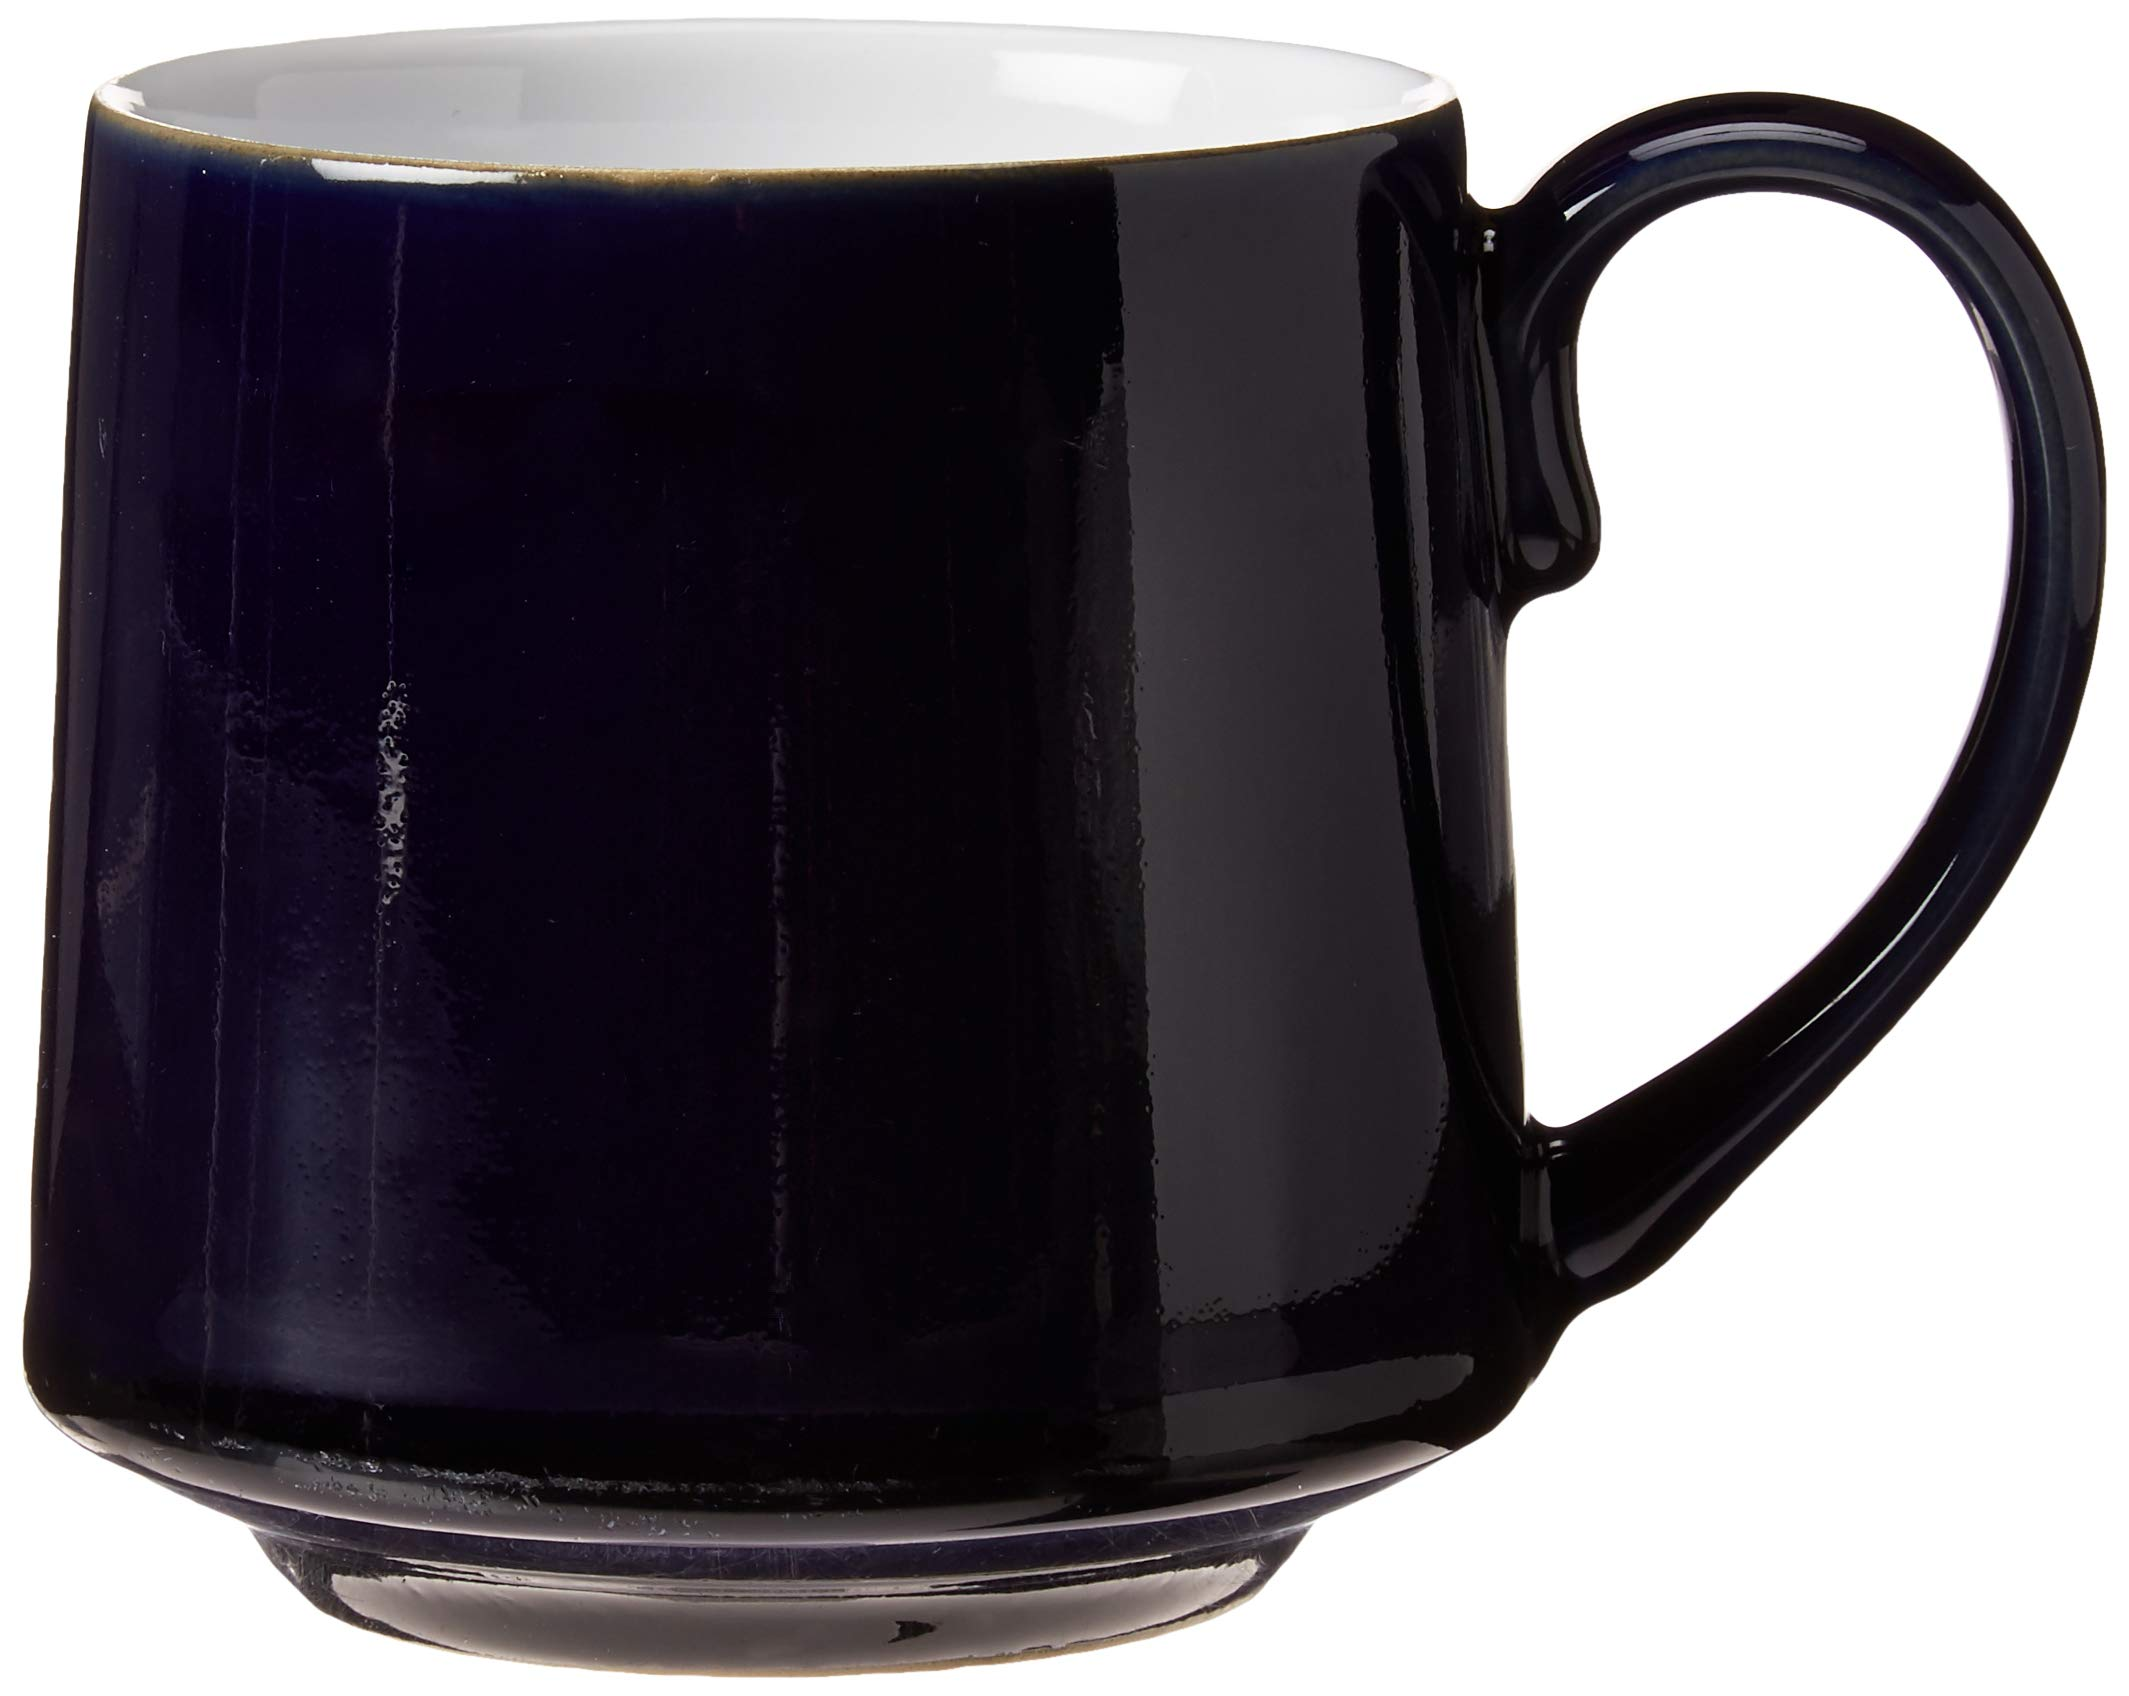 (0.5kg, Malmo Large Mug, Malmo) - Denby MLO-112 Malmo Large Mug, Blue, Medium